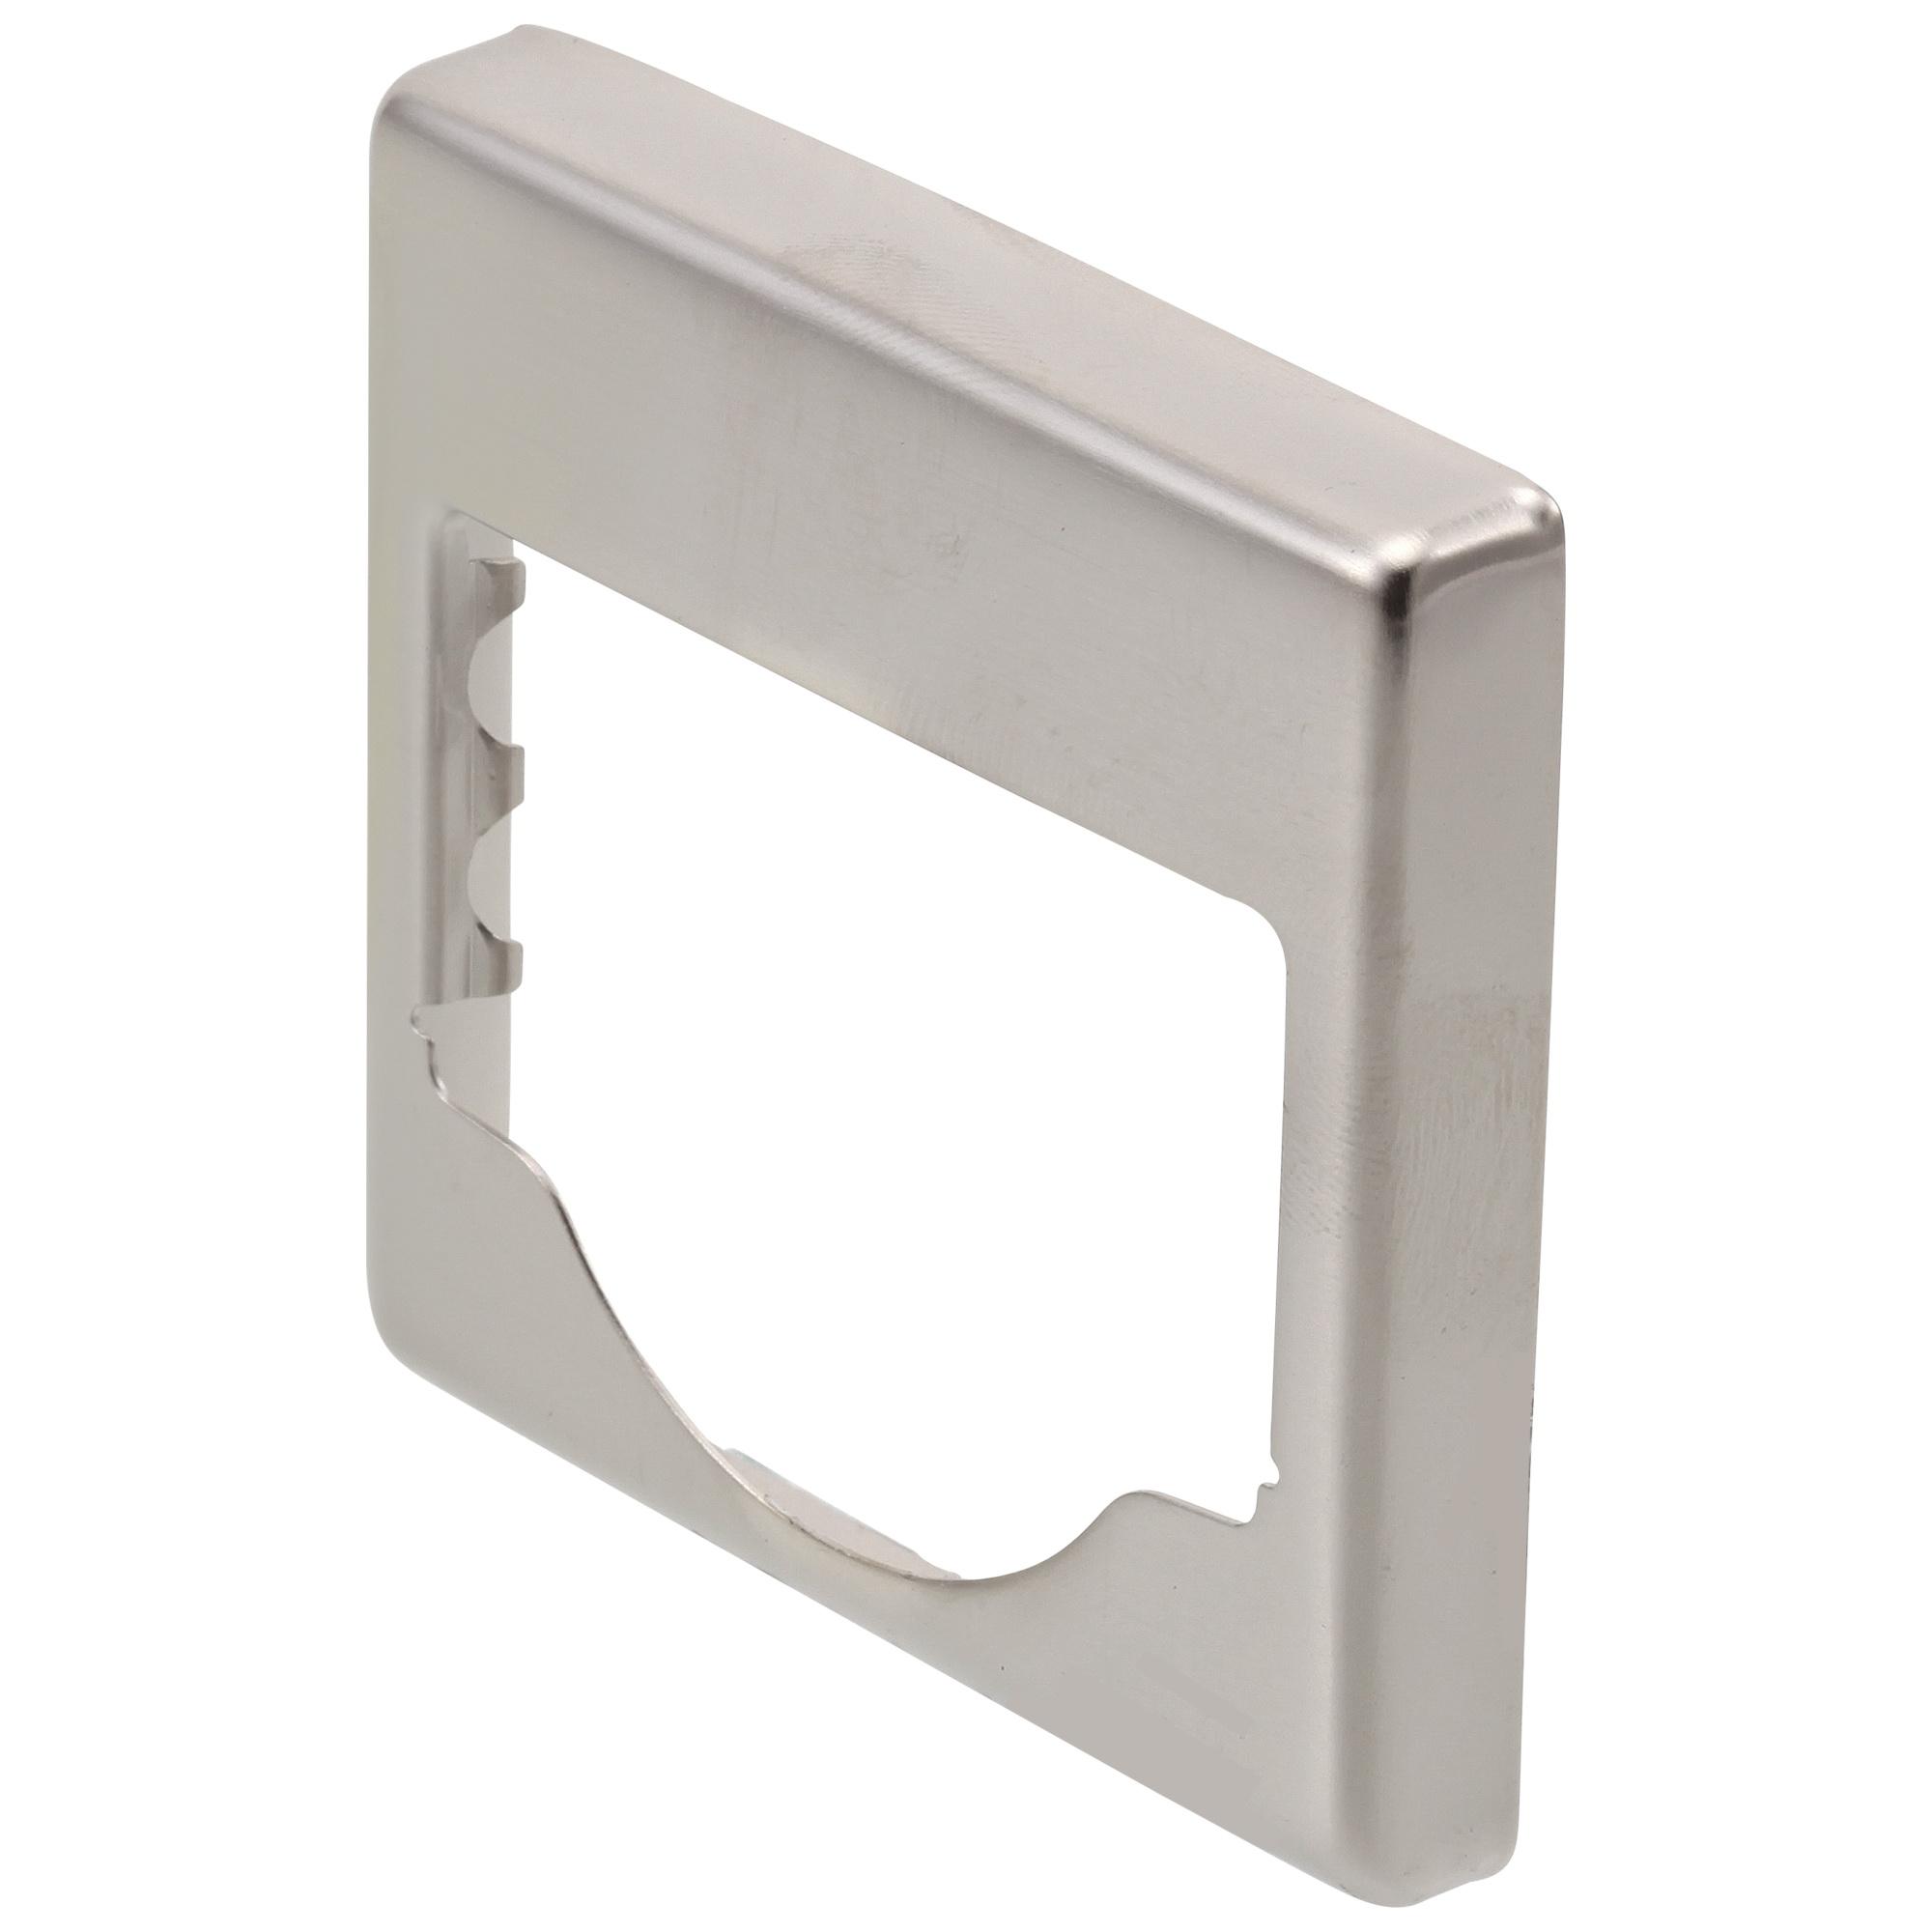 Brizo® RP49761BN Siderna® Tub and Shower Spout Flange, Brushed Nickel, Import